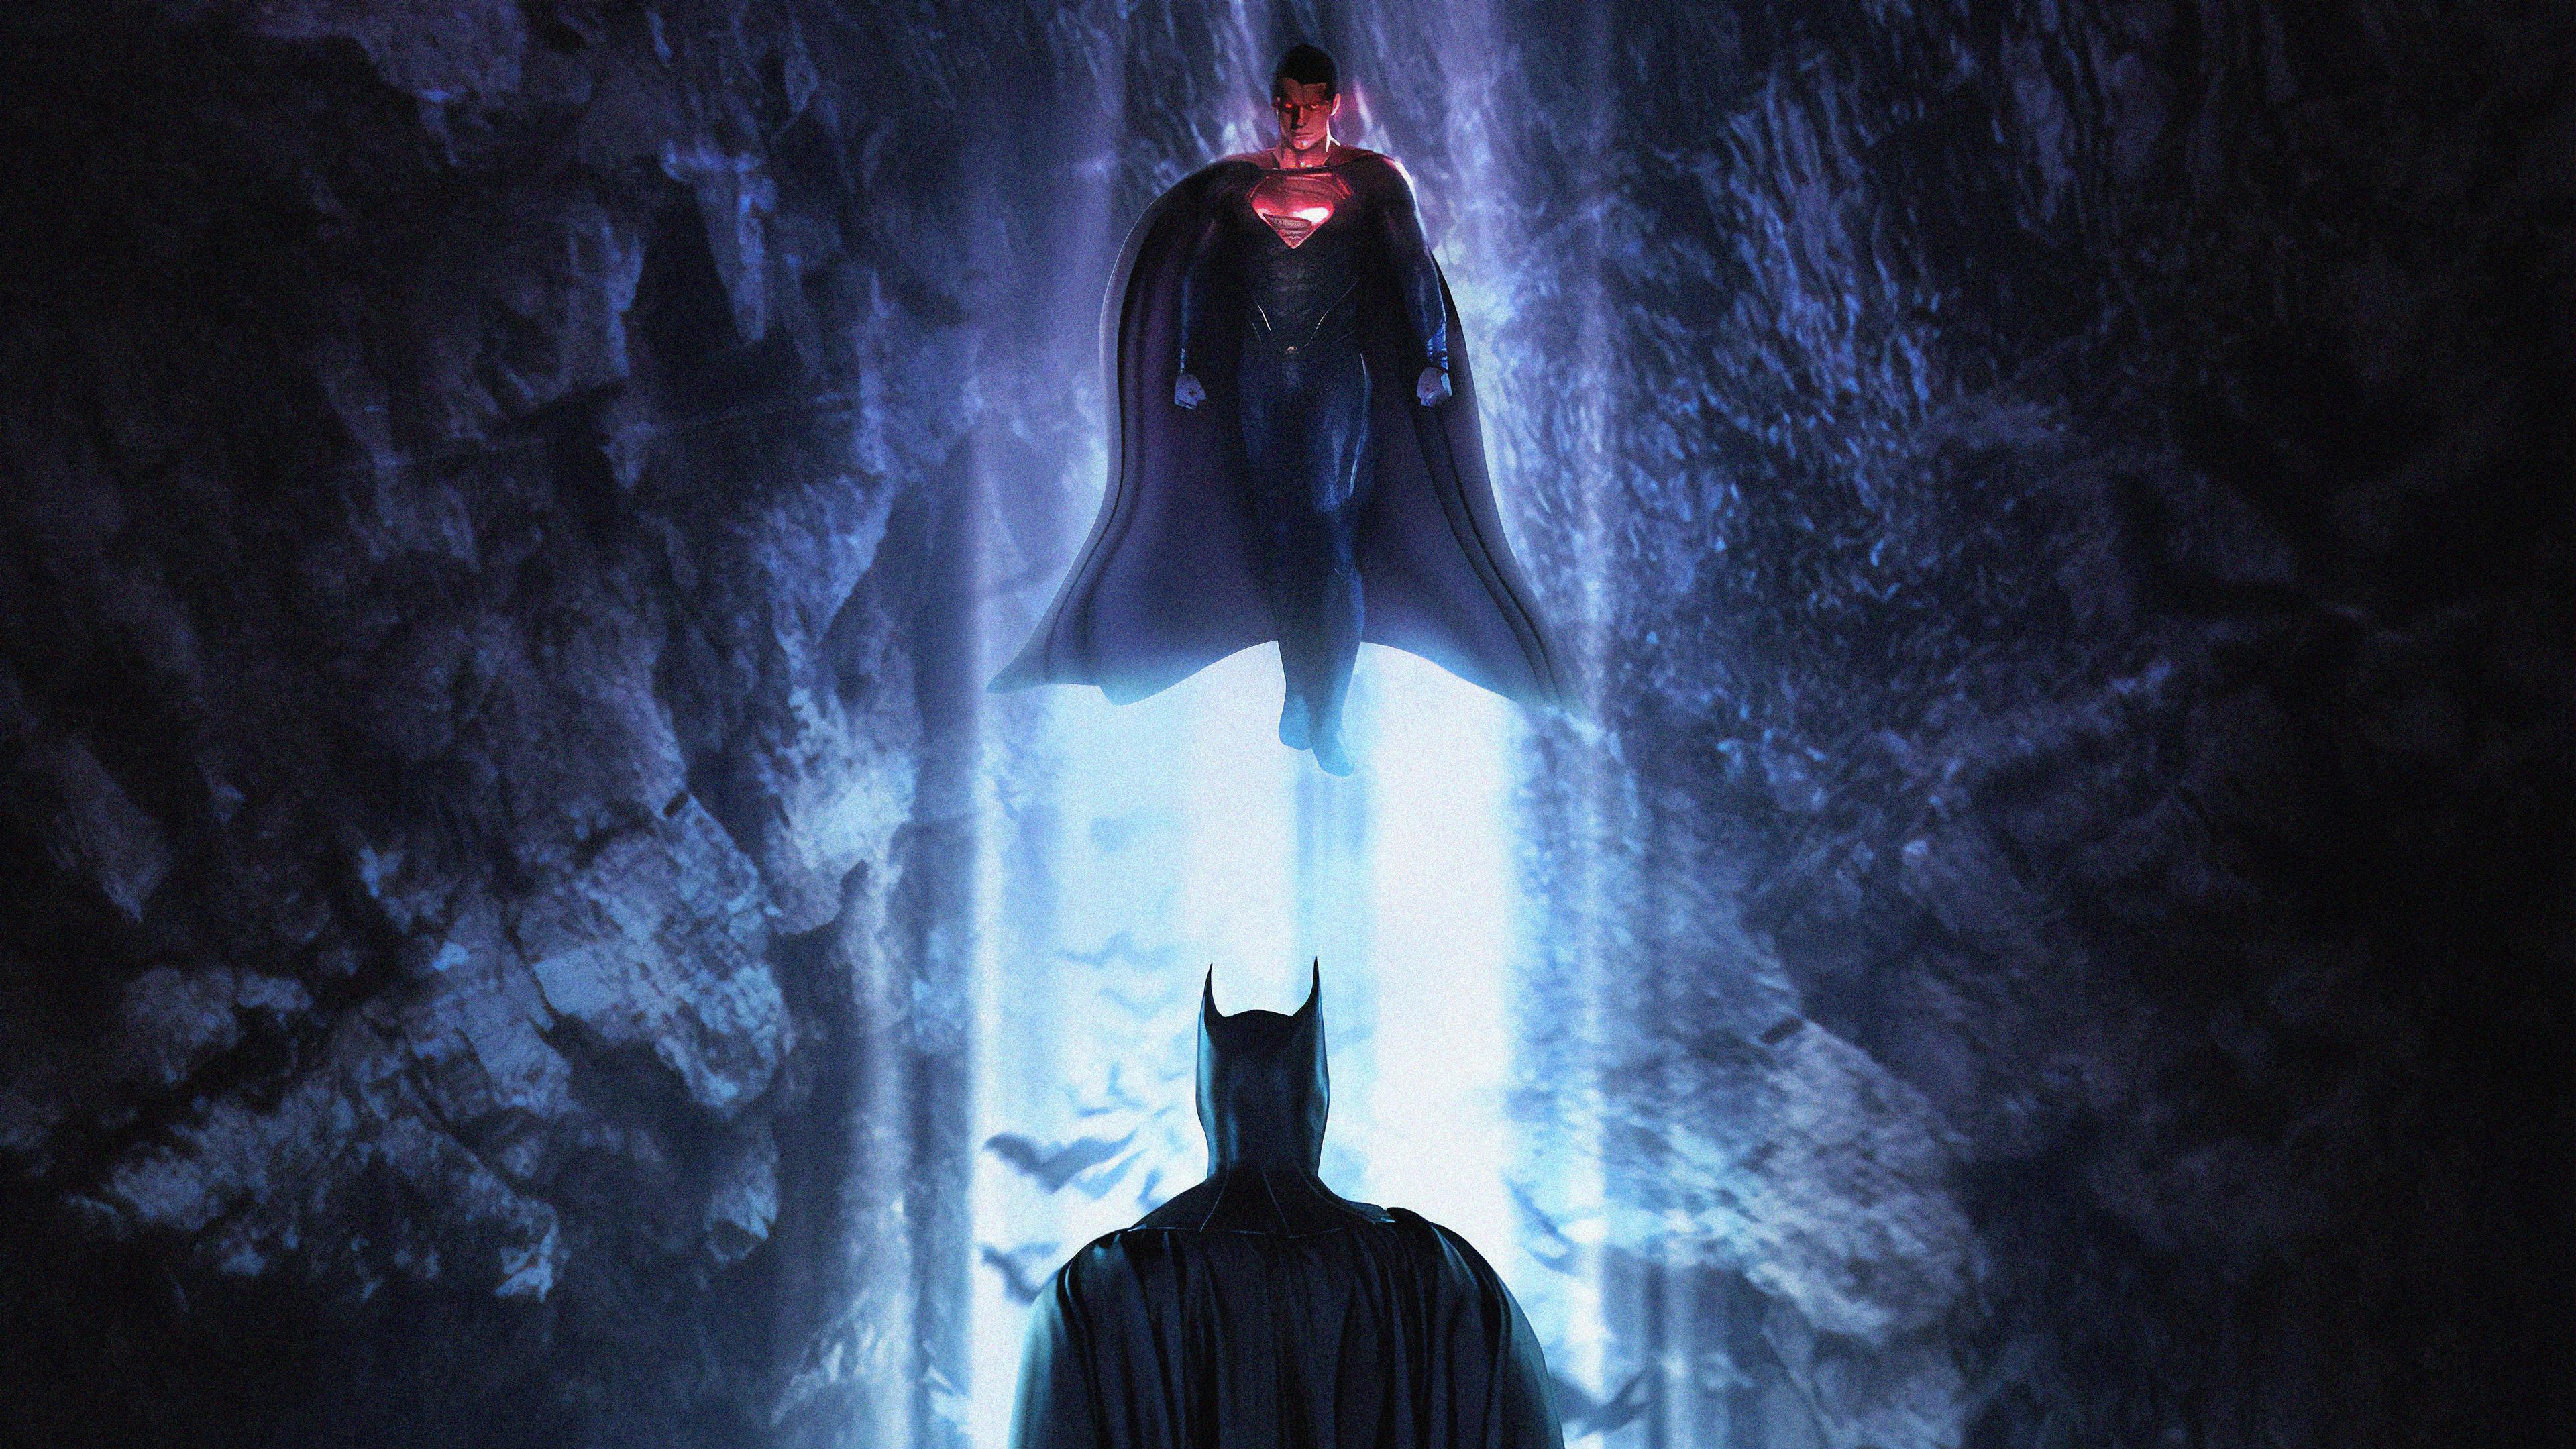 Batman Vs Superman 4k Ultra Hd Wallpaper Background Image